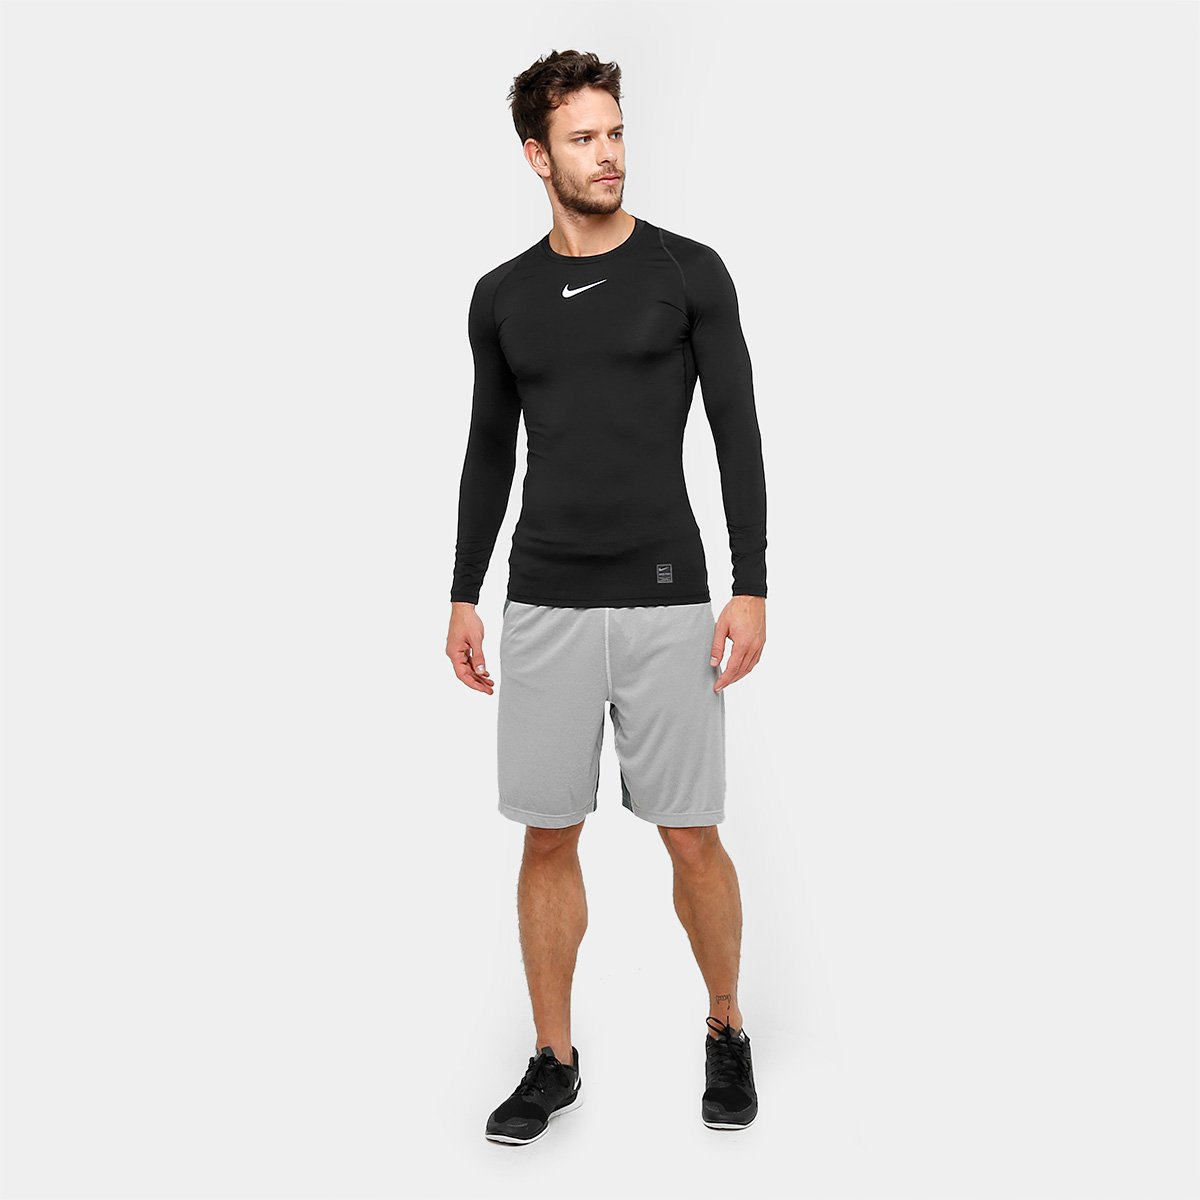 Camiseta Compressão Nike Pro Manga Longa Masculina - Compre Agora ... 10edf23e15ed6